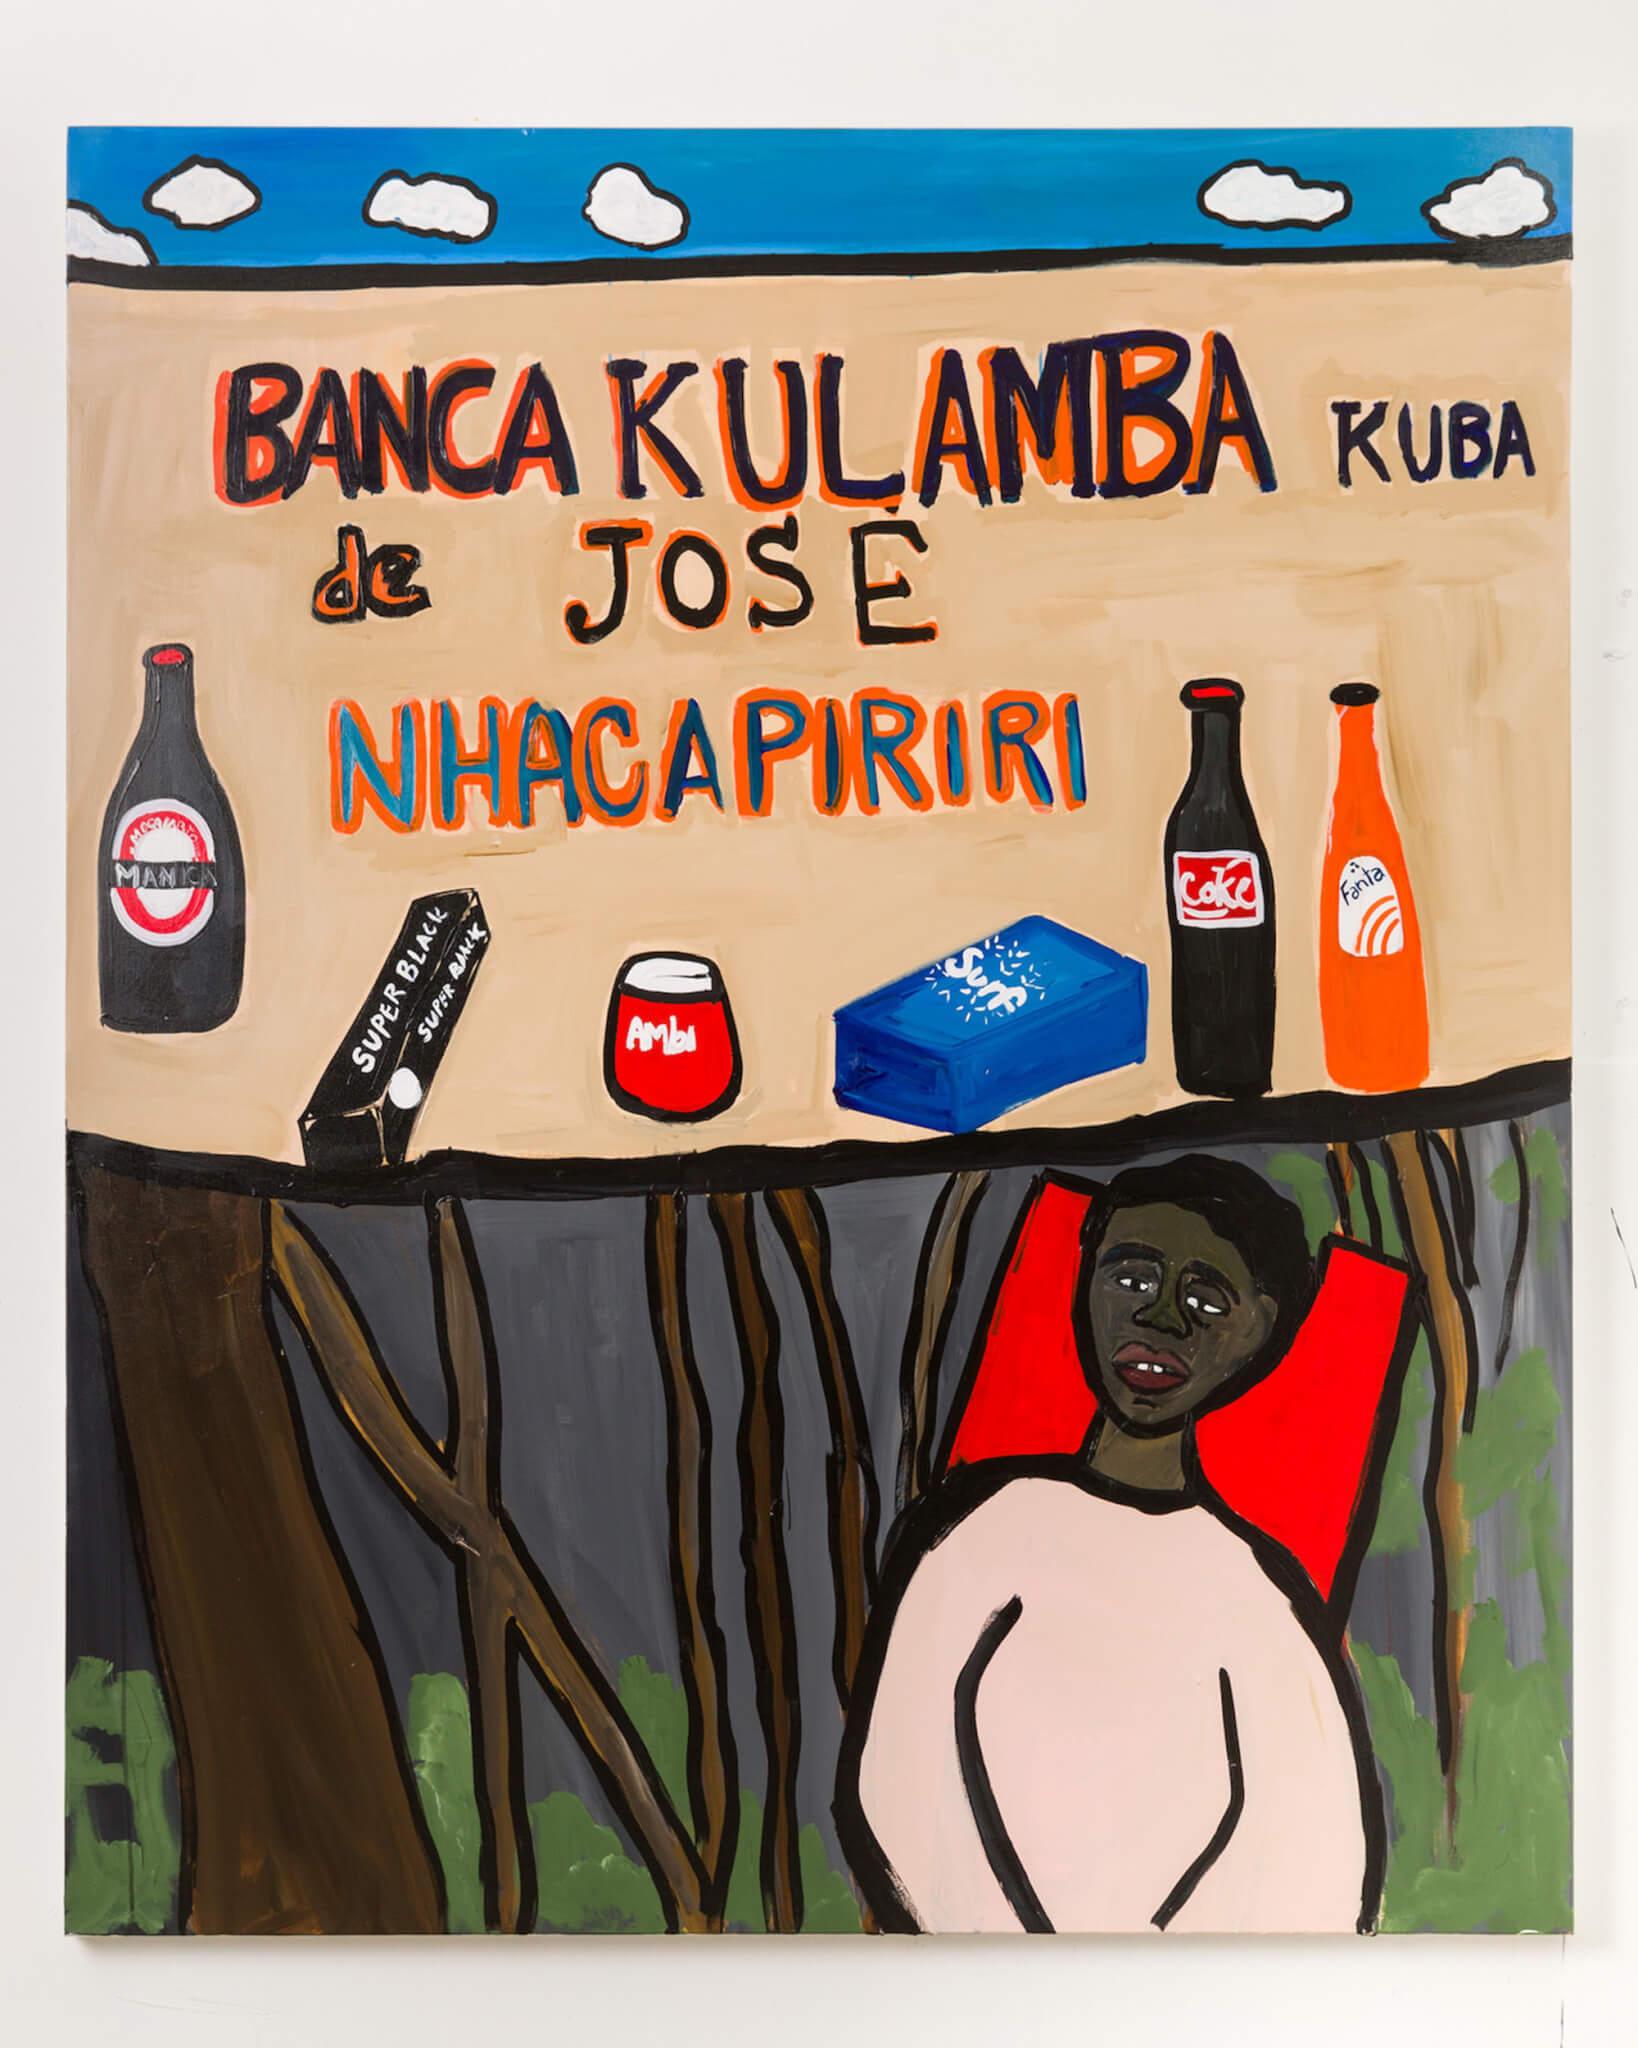 Namoda, Banca Kulumba, 2019 (CN 19.015) copy